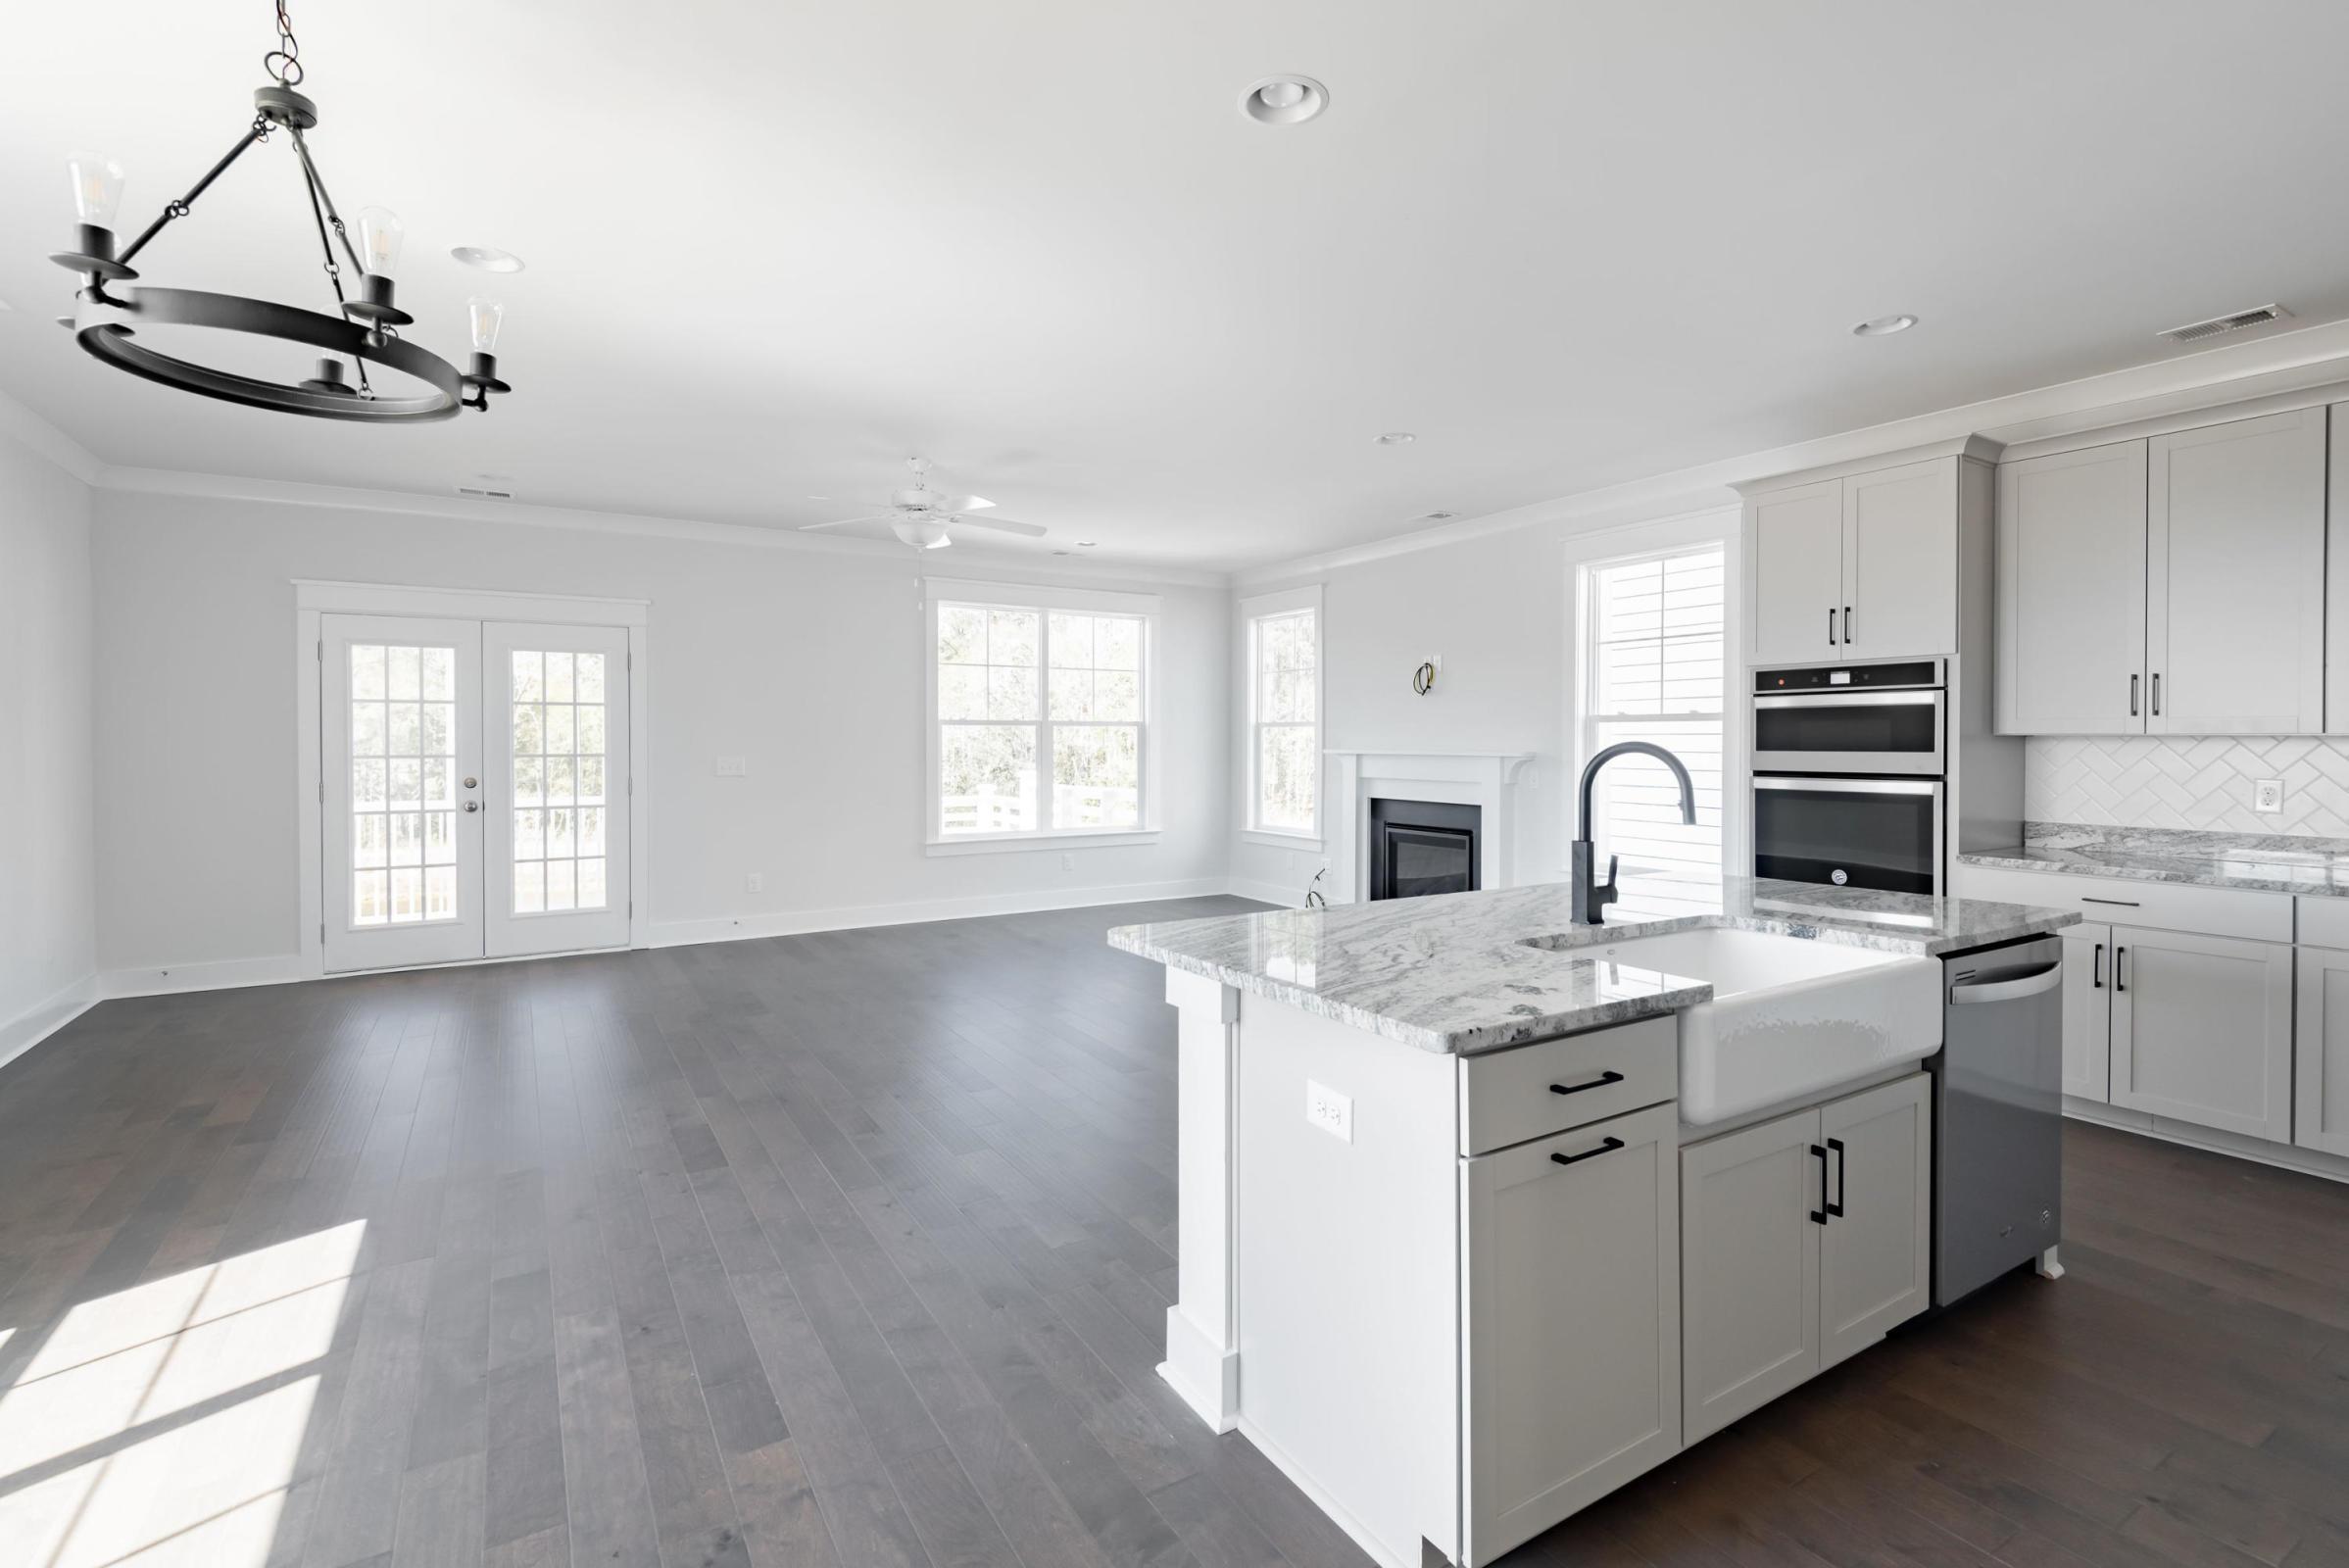 James Island Homes For Sale - 1397 Harbor View, Charleston, SC - 16